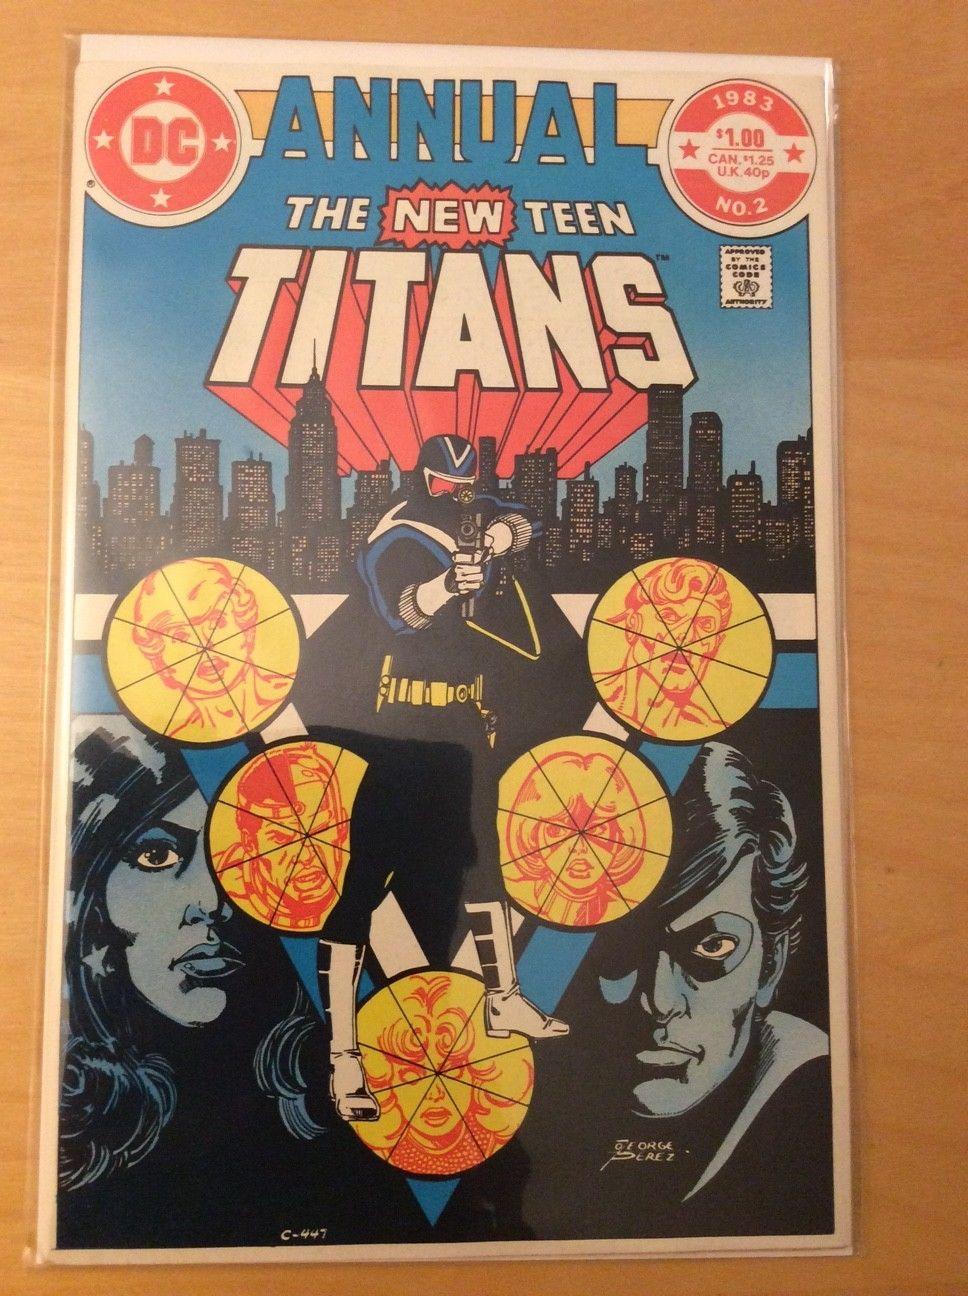 Titans #2 FN 2008 Stock Image